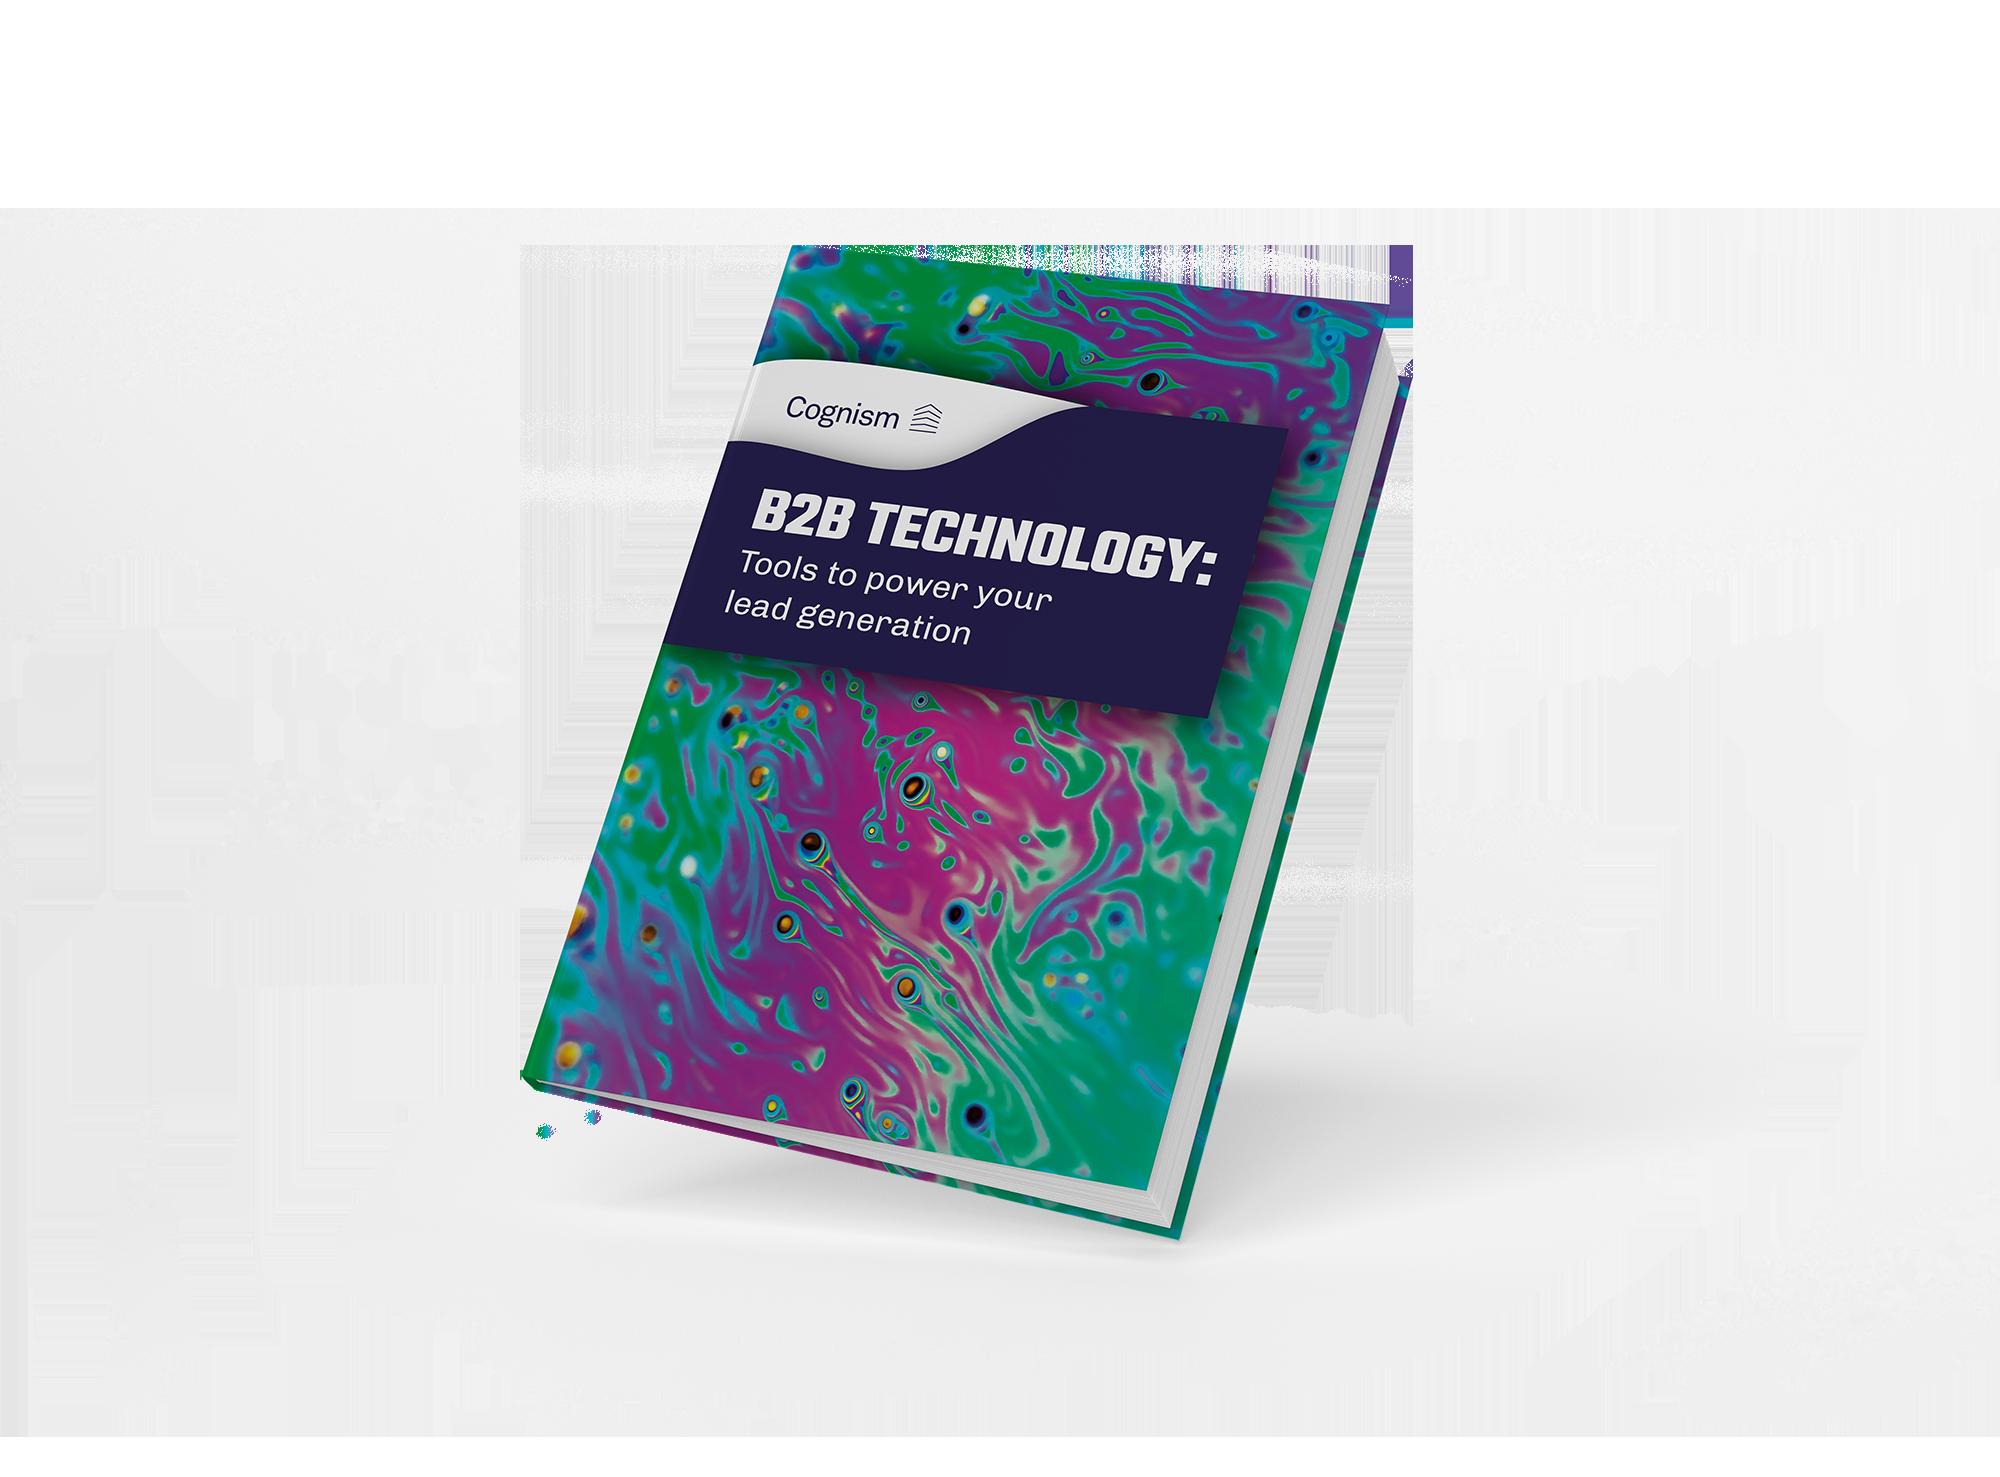 B2B TECHNOLOGY 3D V2